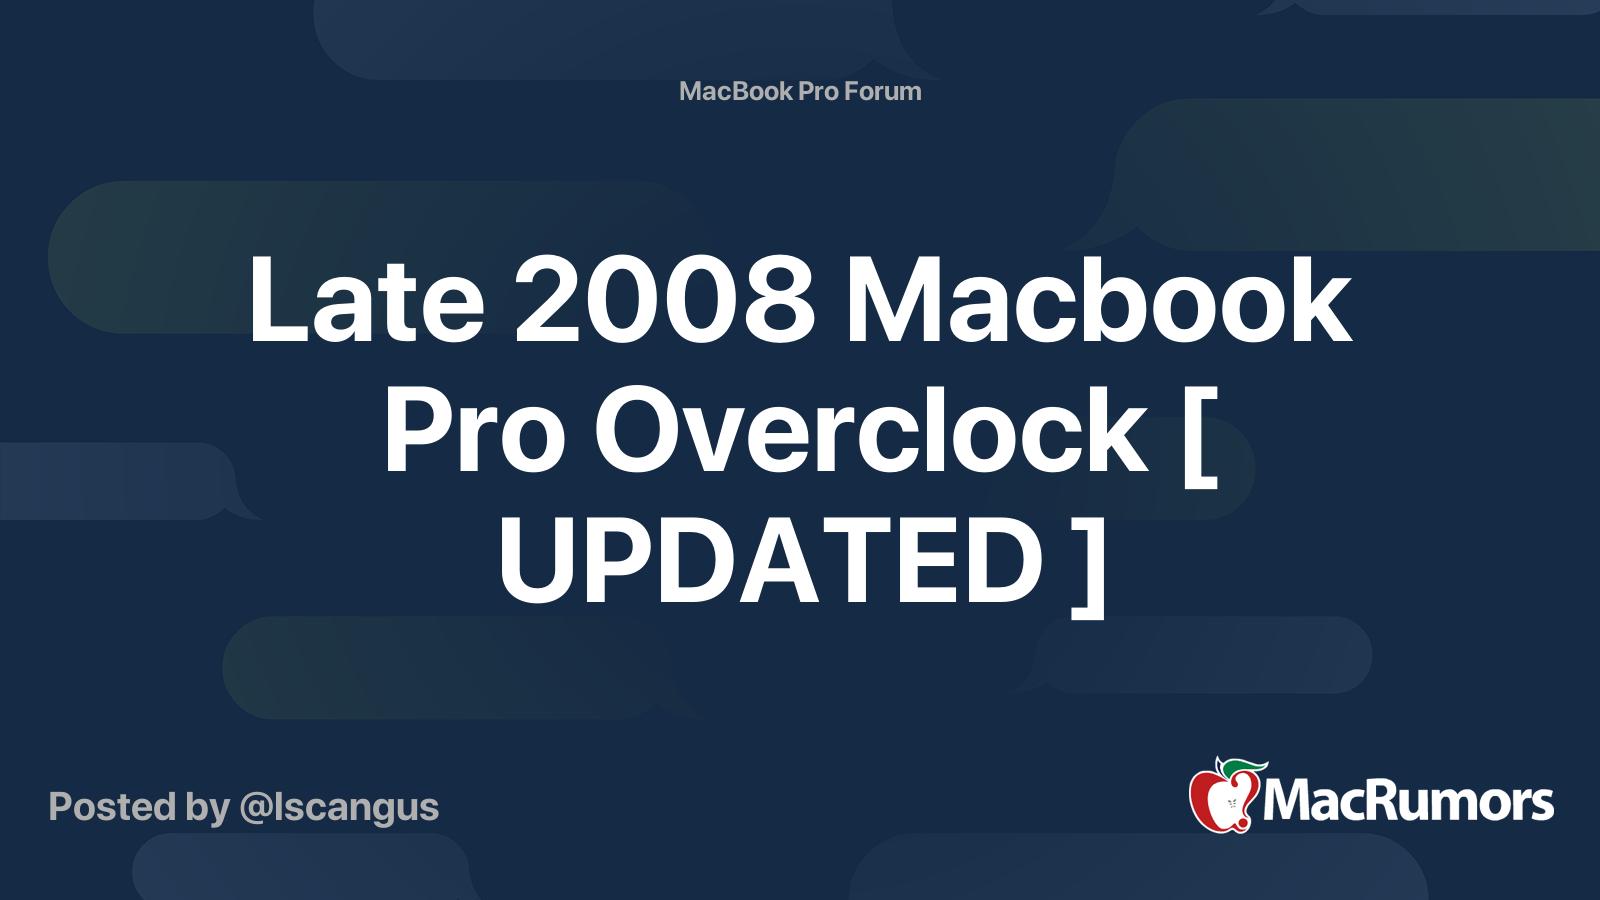 Late 2008 Macbook Pro Overclock  UPDATED  | MacRumors Forums